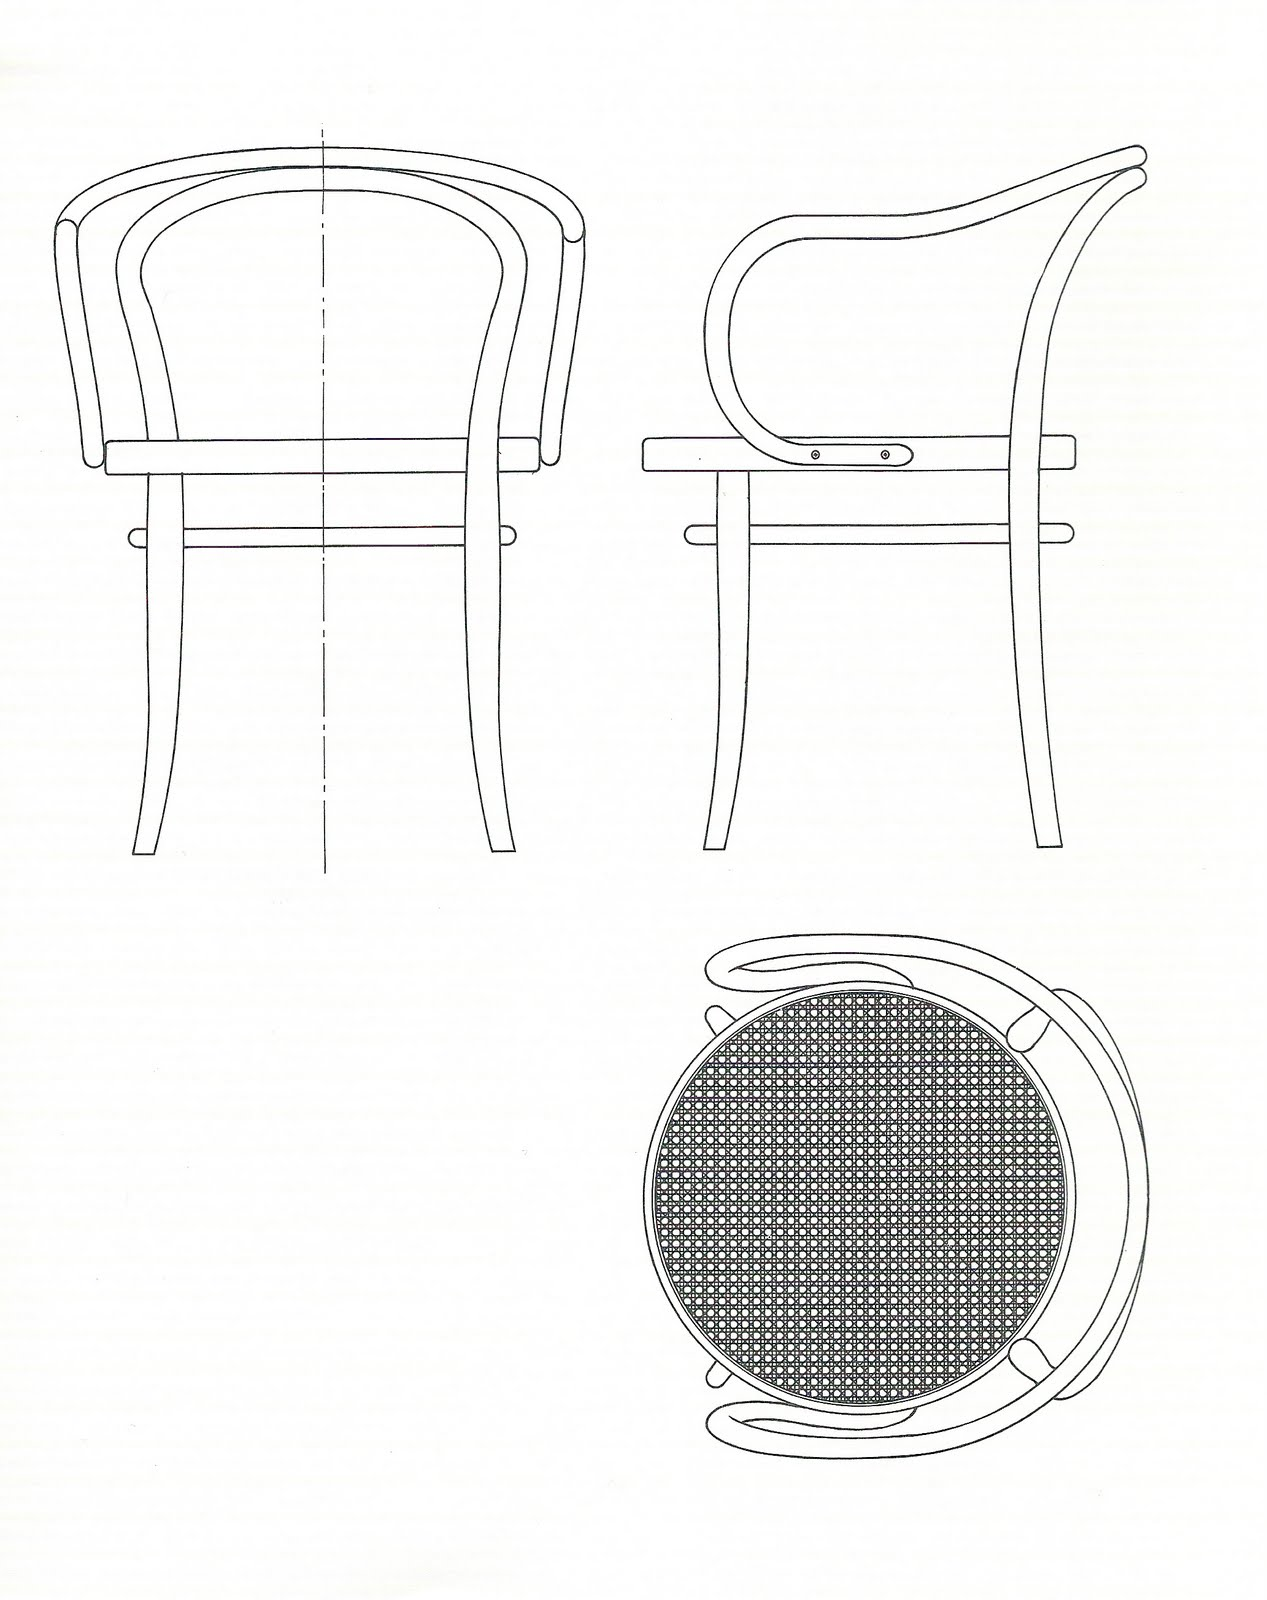 Scm wet dry sedia thonet thonet chair for Poltrone design dwg